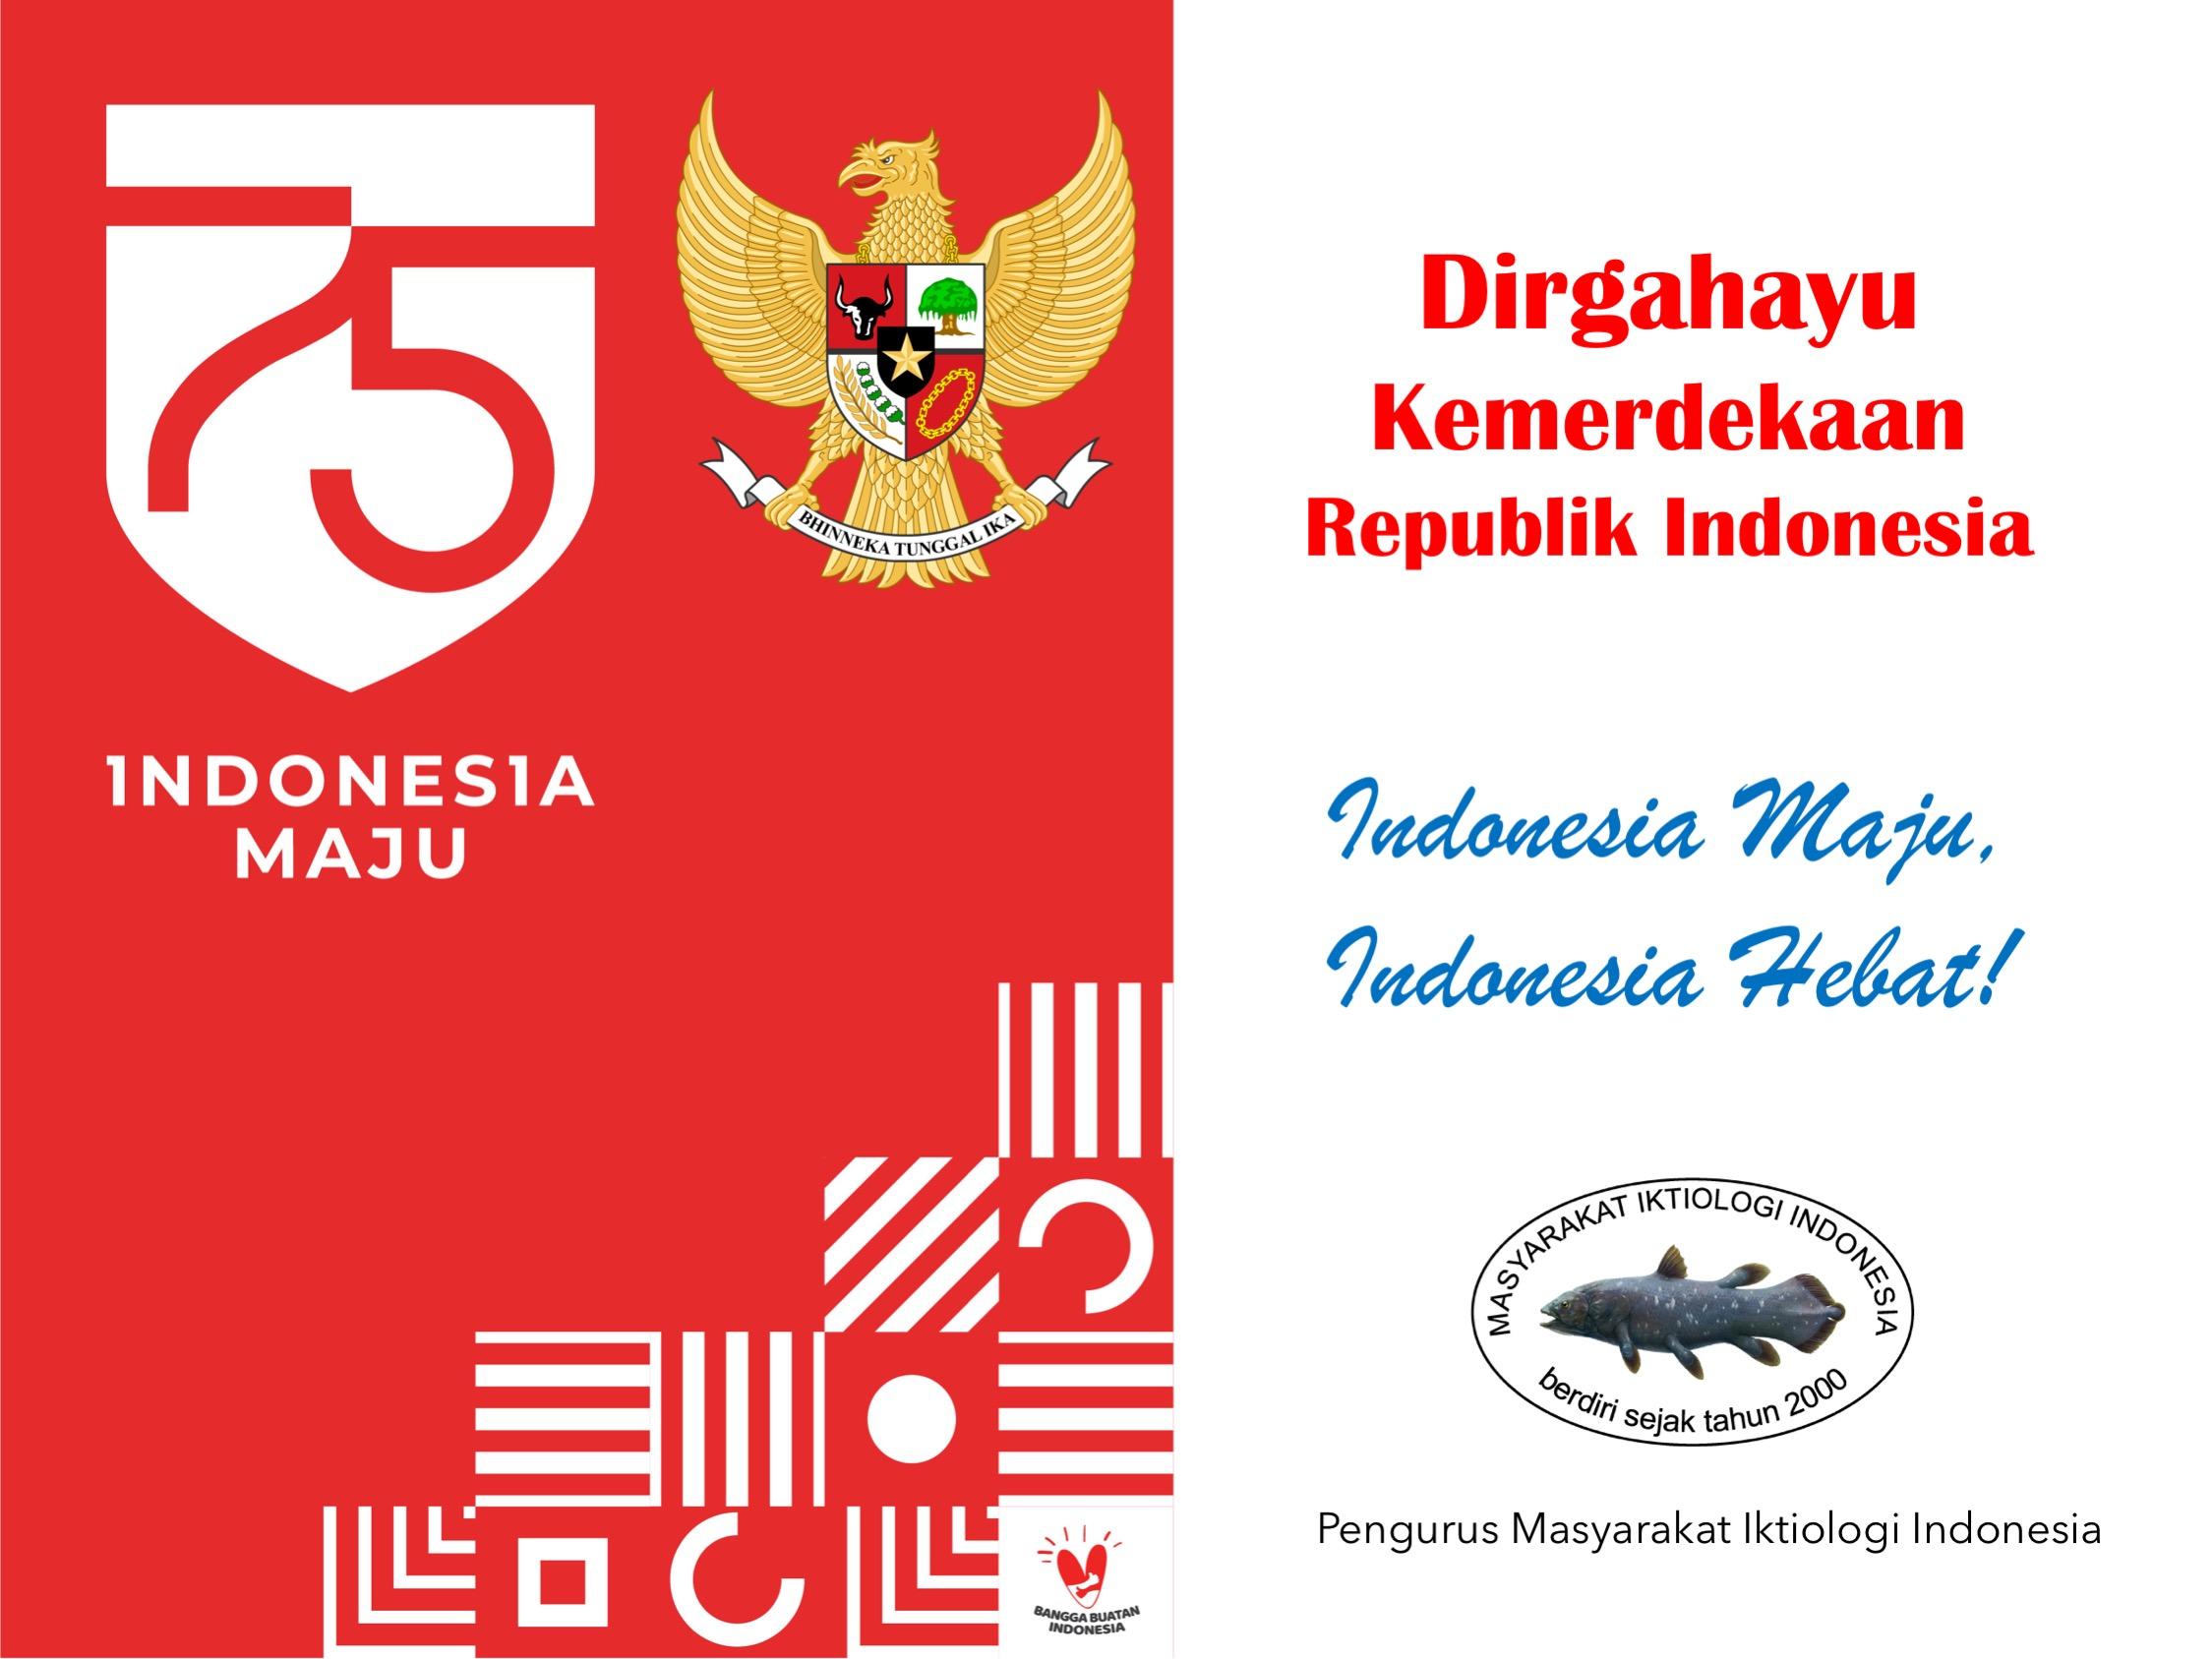 Dirgahayu Kemerdekaan Republik Indonesia